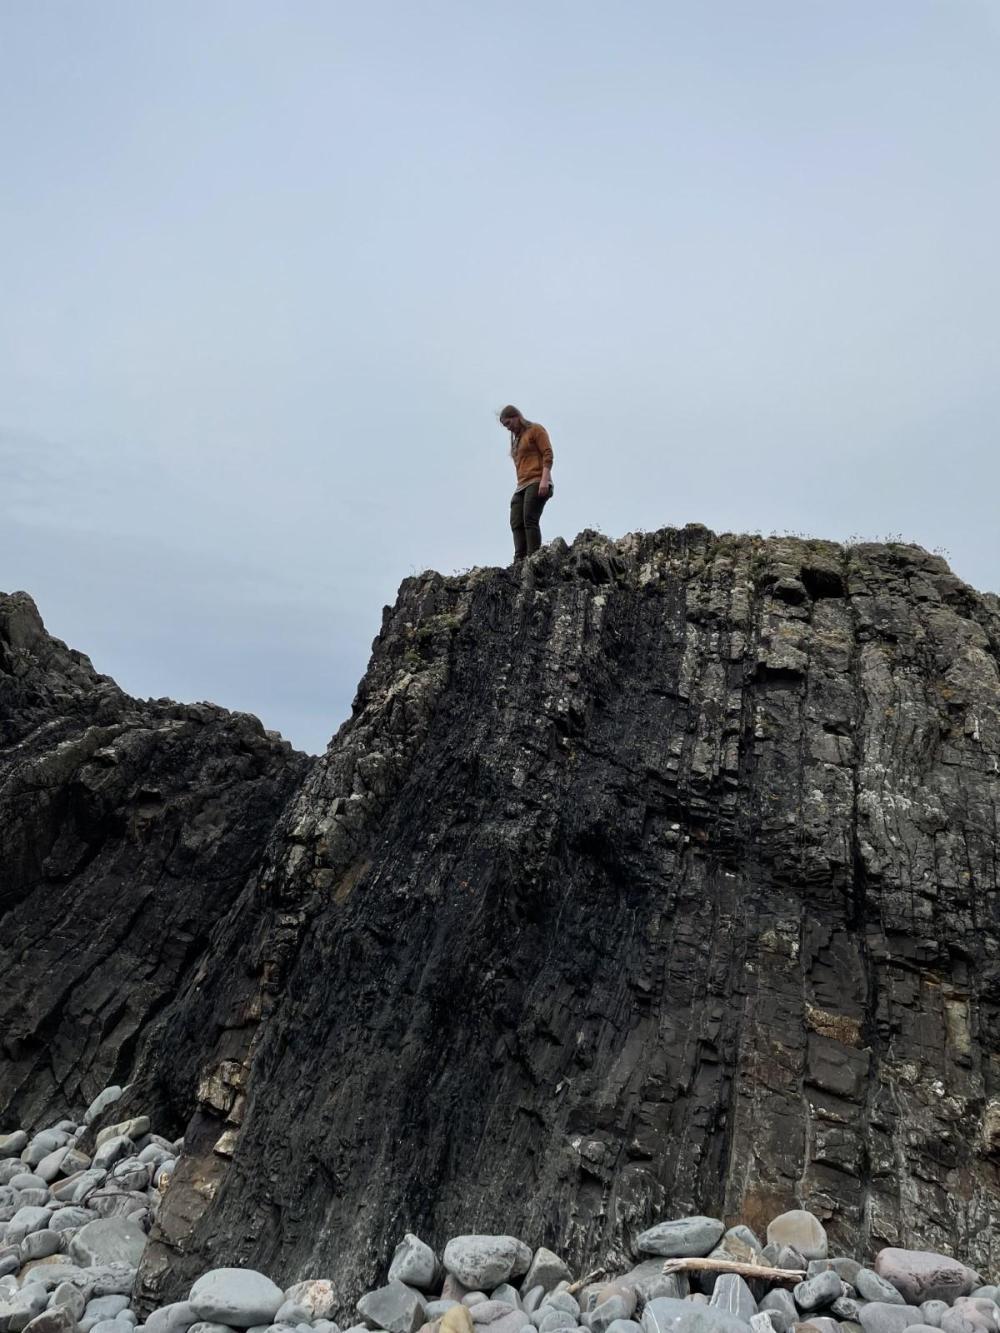 Splodz Blogz | On Blackchurch Rock